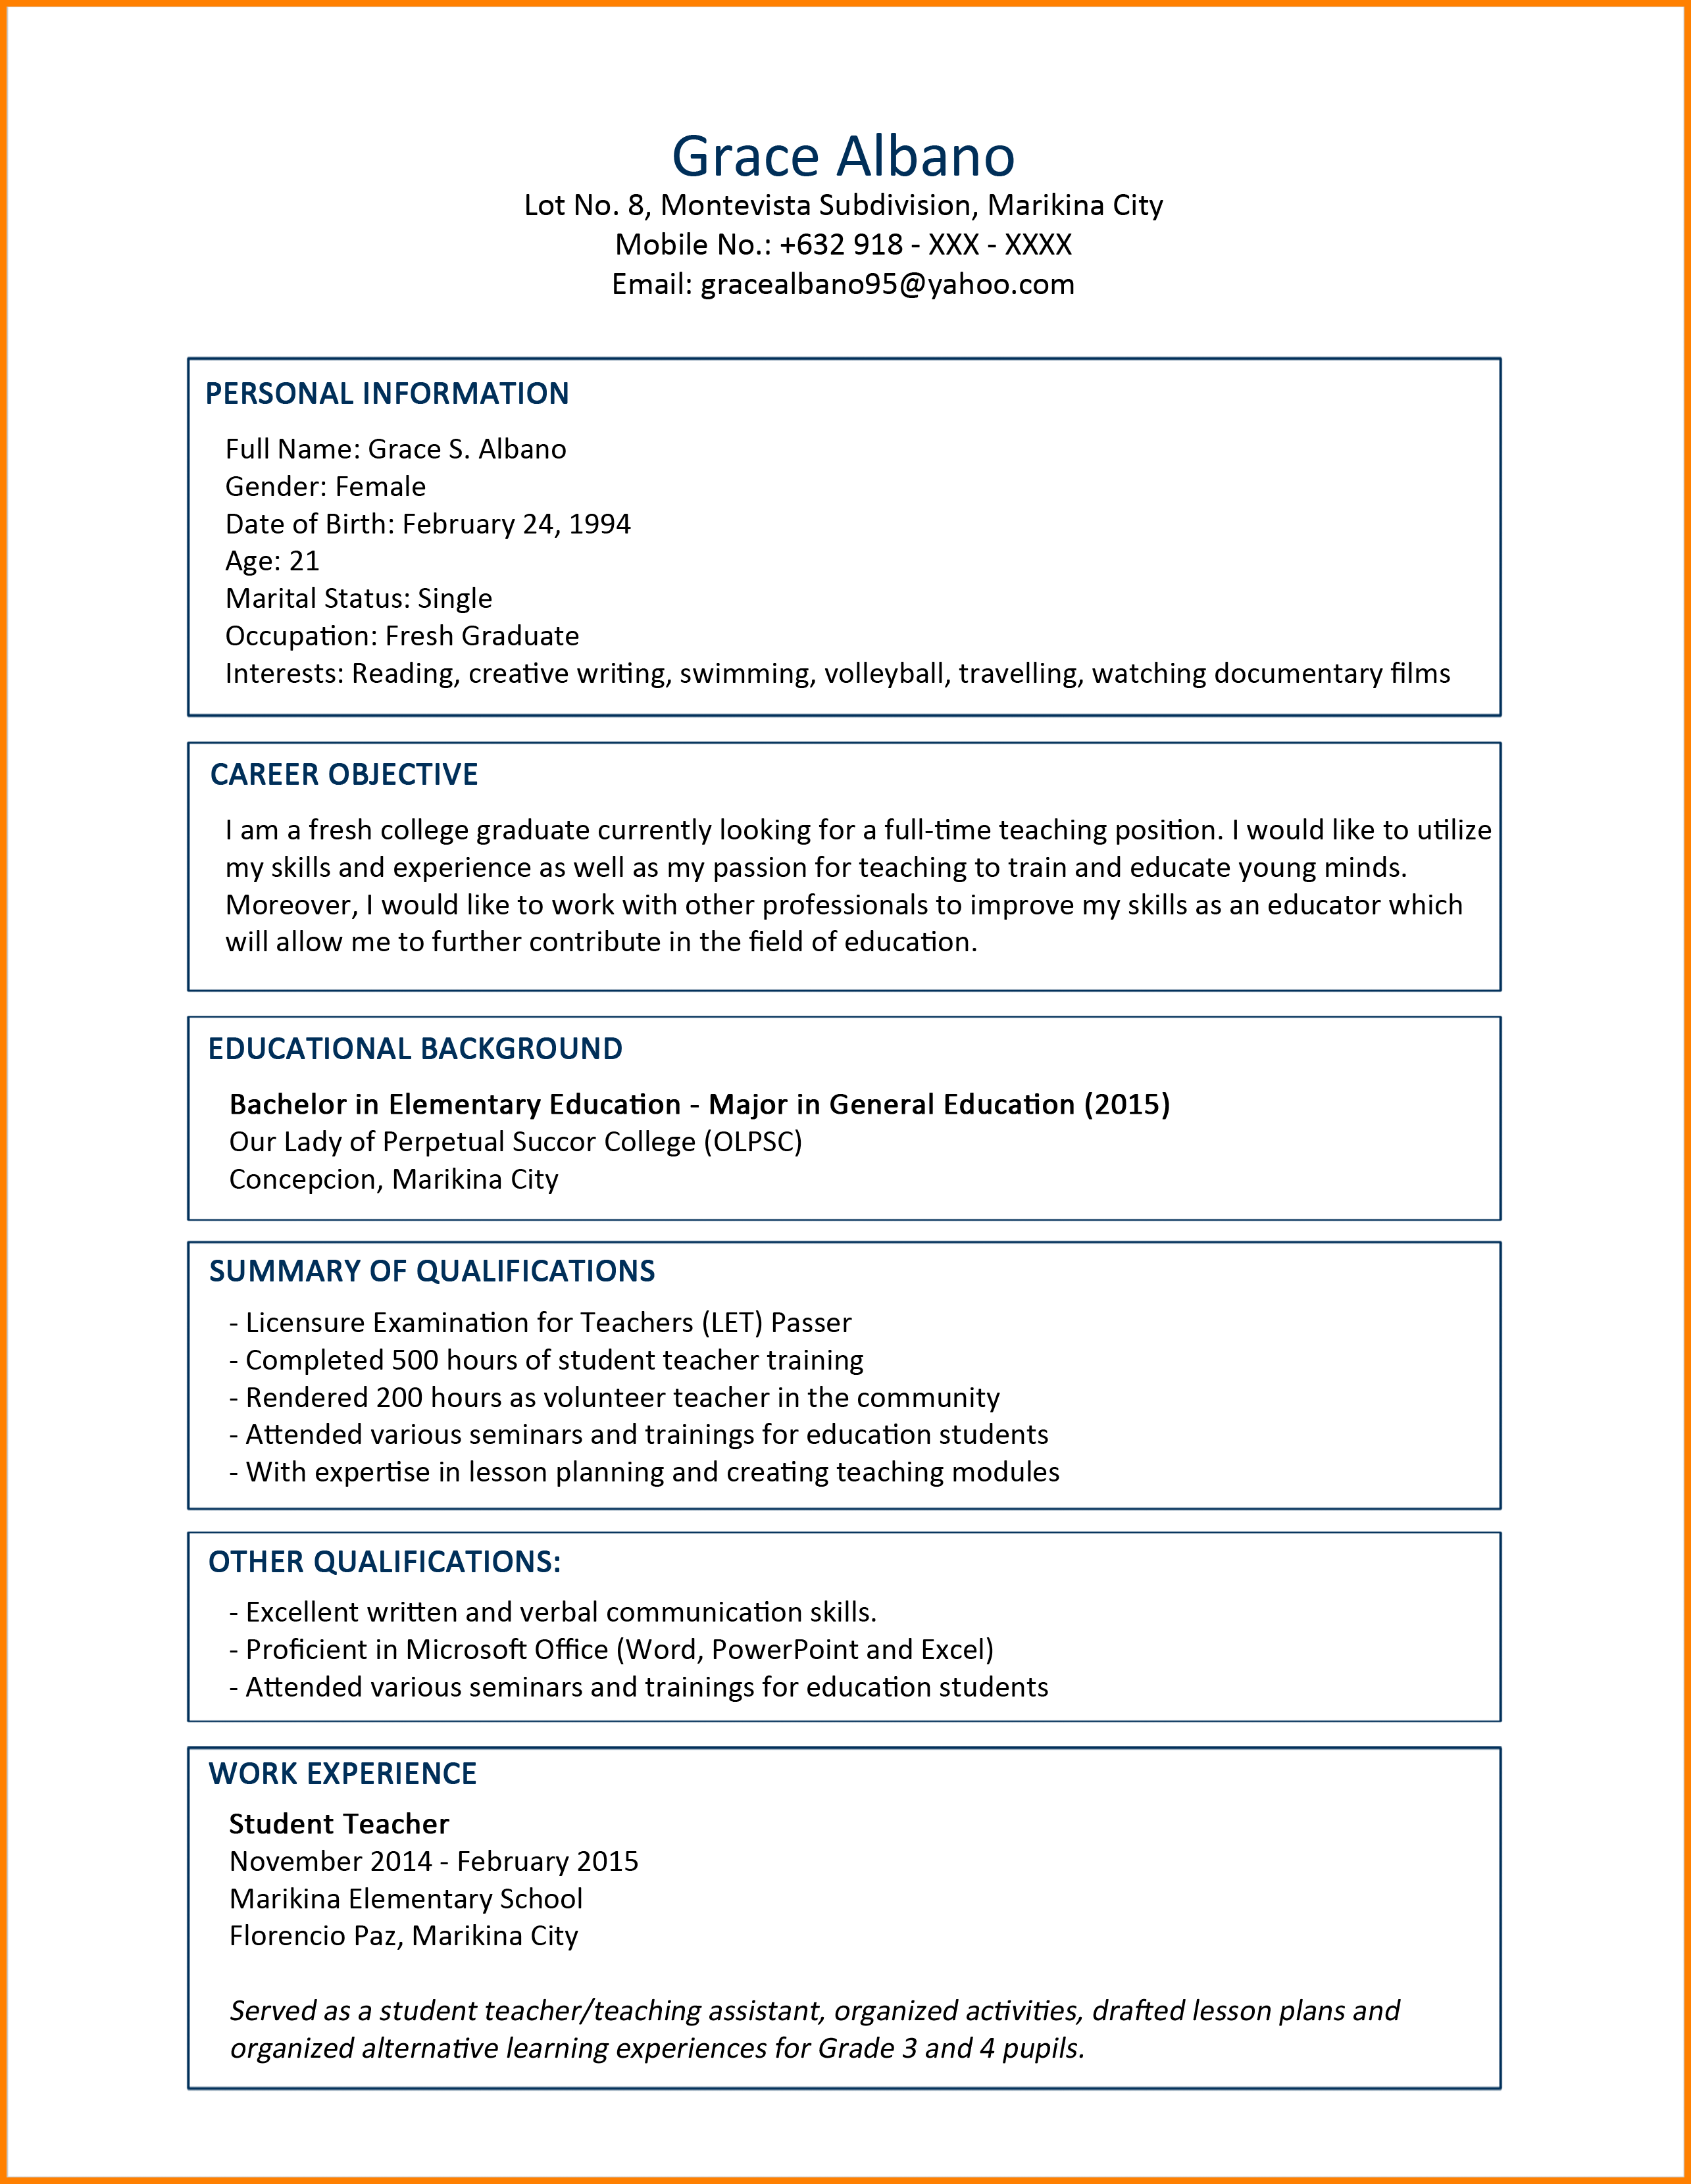 Sample Resume Format For Fresh Graduates Sample Resume Format For Fresh Graduates Sample Resume Format Foresh Graduates O Referensi Desain Posting Inspirasi